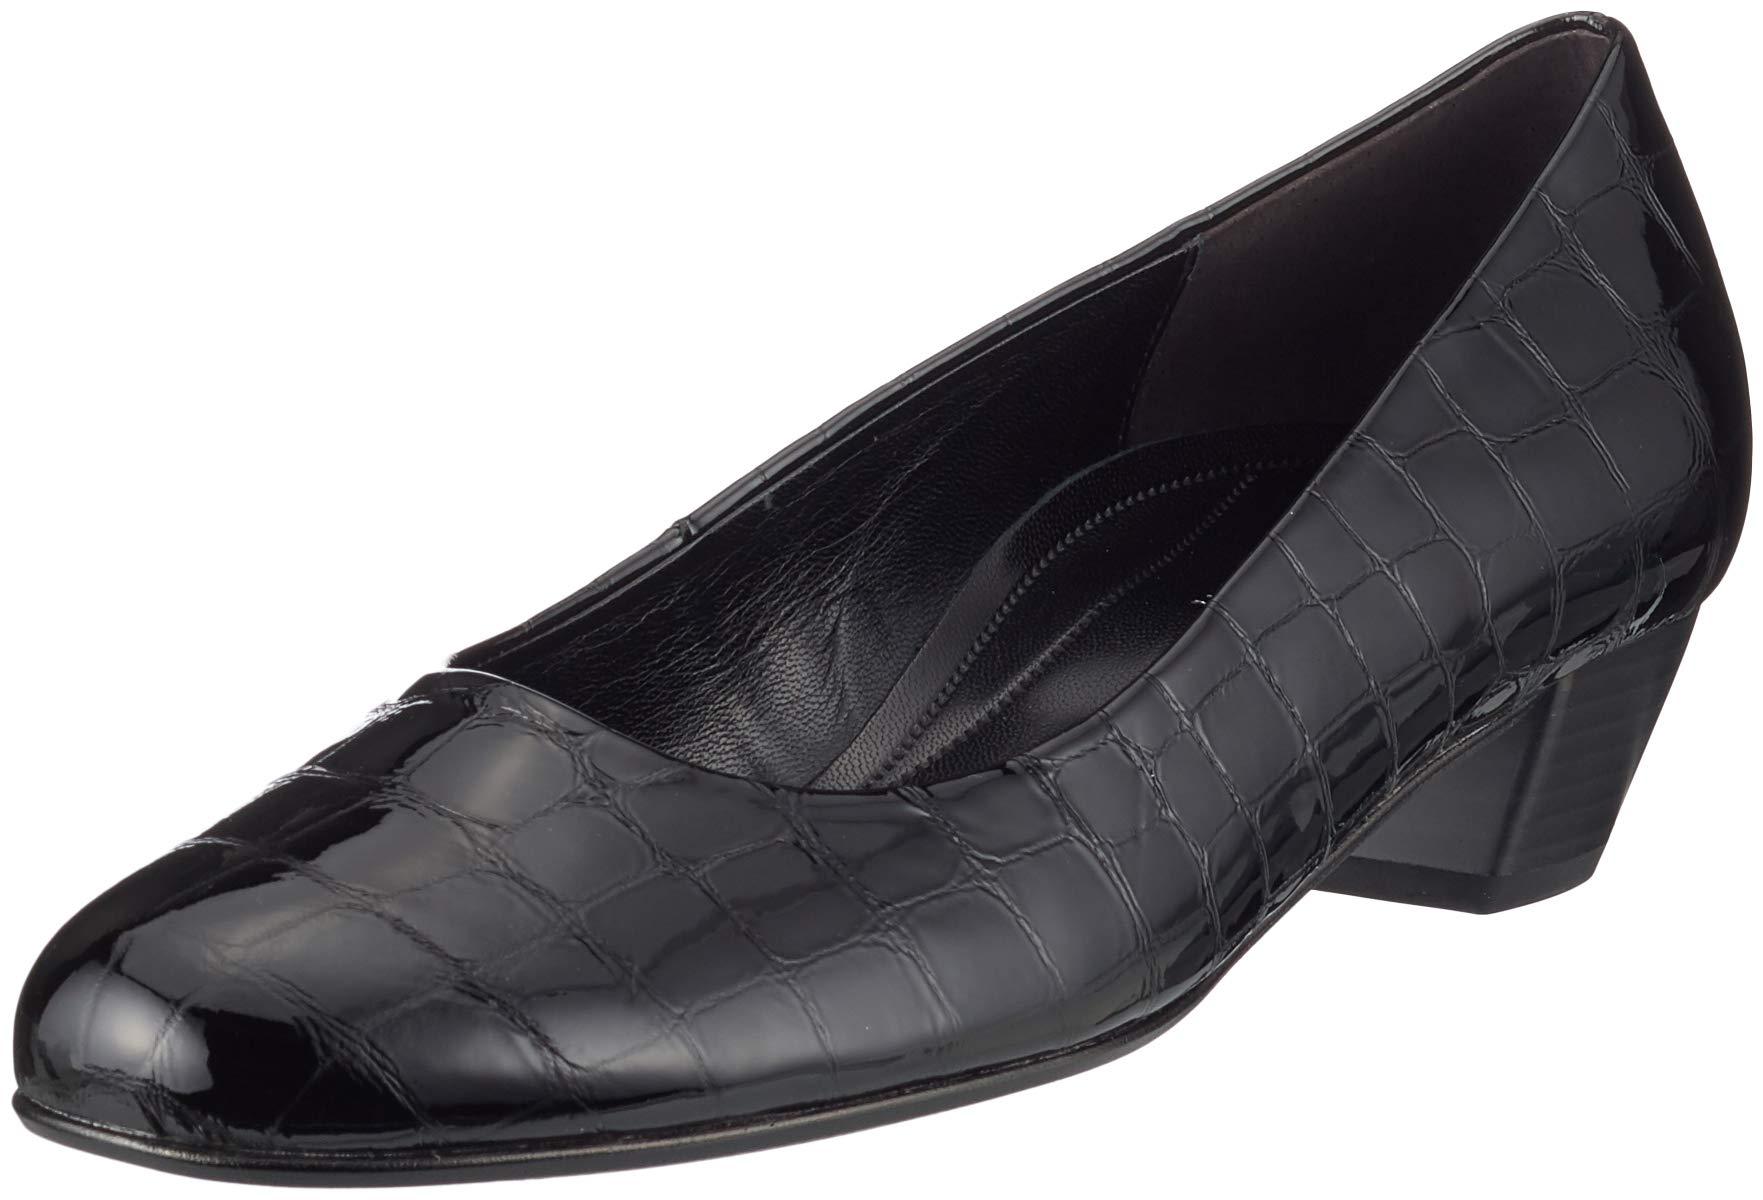 FemmeNoirschwarz BasicEscarpins Gabor Shoes Eu Comfort 9740 l5uTKcFJ13